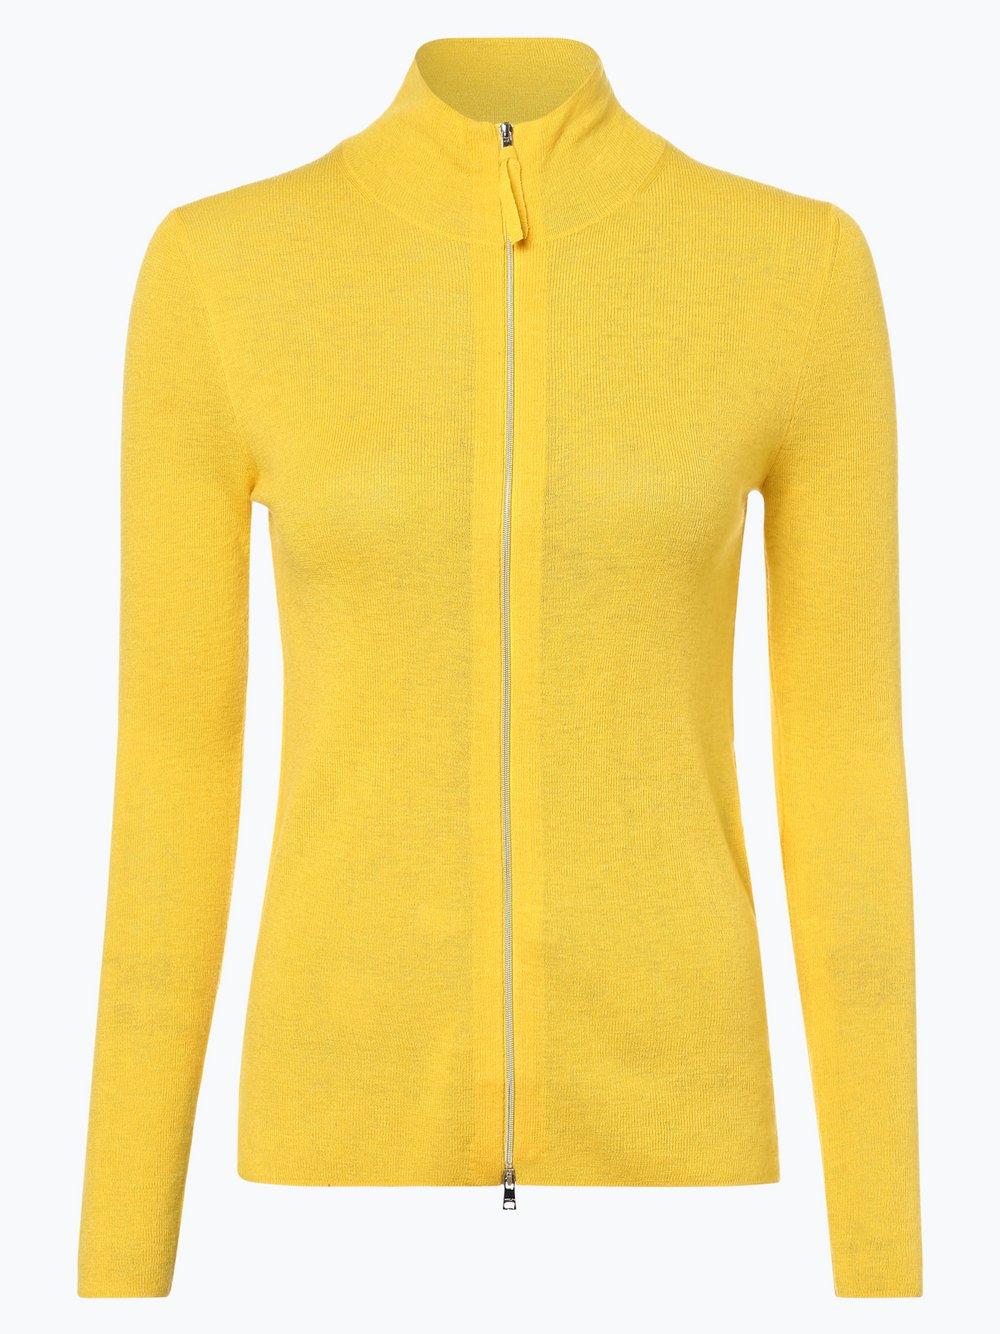 Marc Cain Collections – Kardigan damski z dodatkiem kaszmiru, żółty Van Graaf 440489-0001